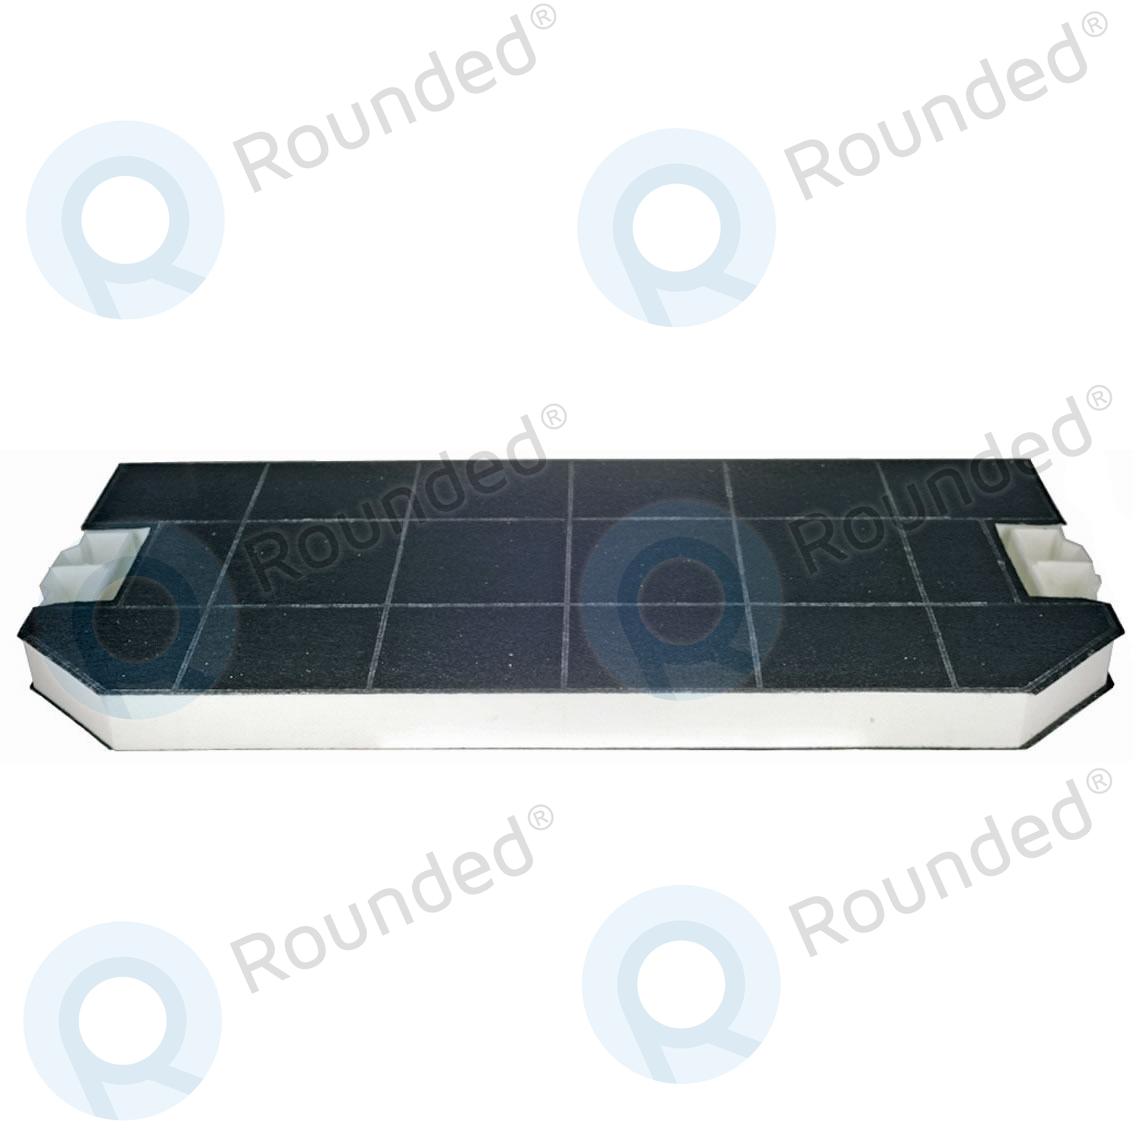 Bosch / Siemens  Active carbon filter 49x23.5cm (460367) 00460367 image-1